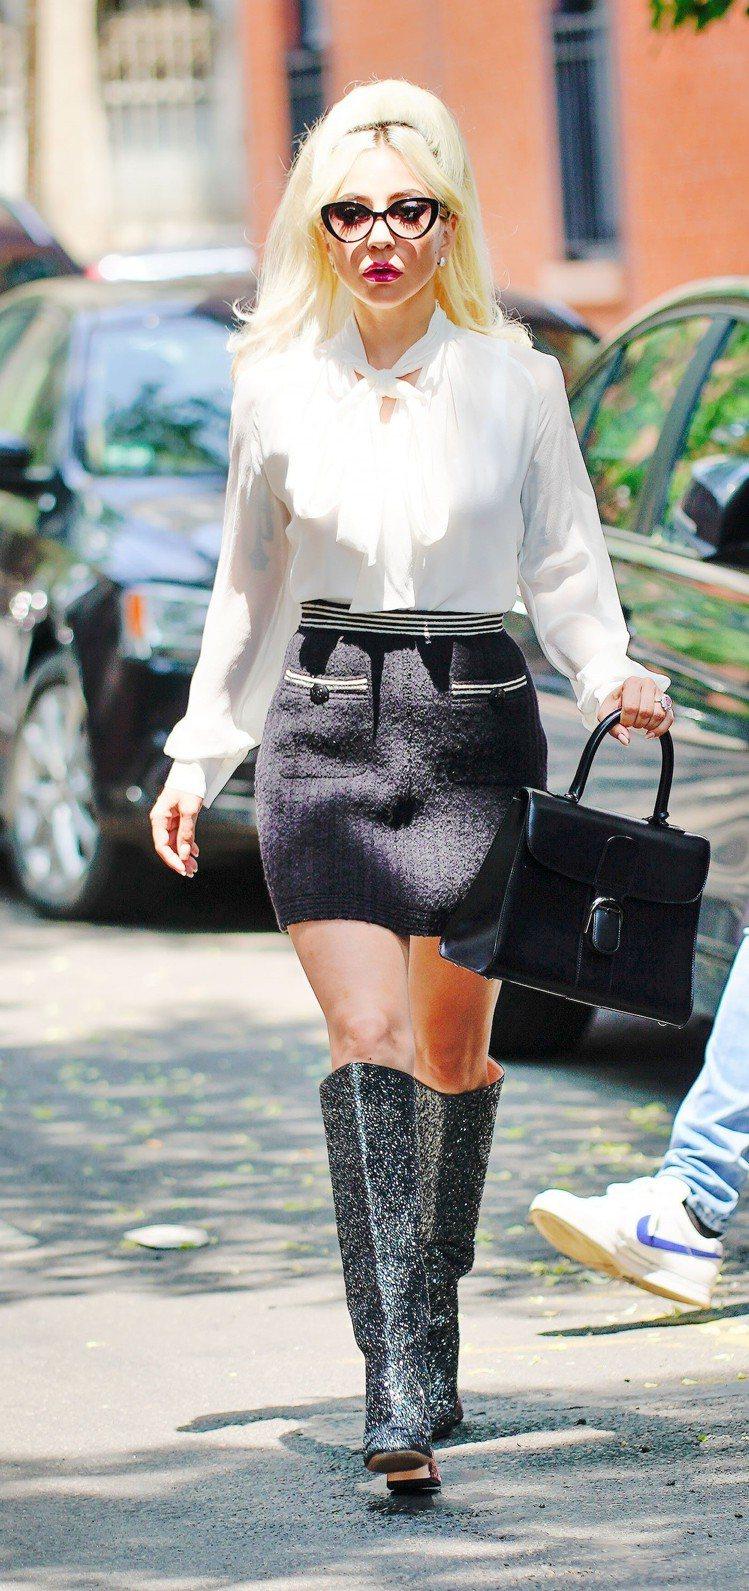 以Brillant包款搭襯,Lady Gaga也能展現性感帥氣。圖/DELVAU...